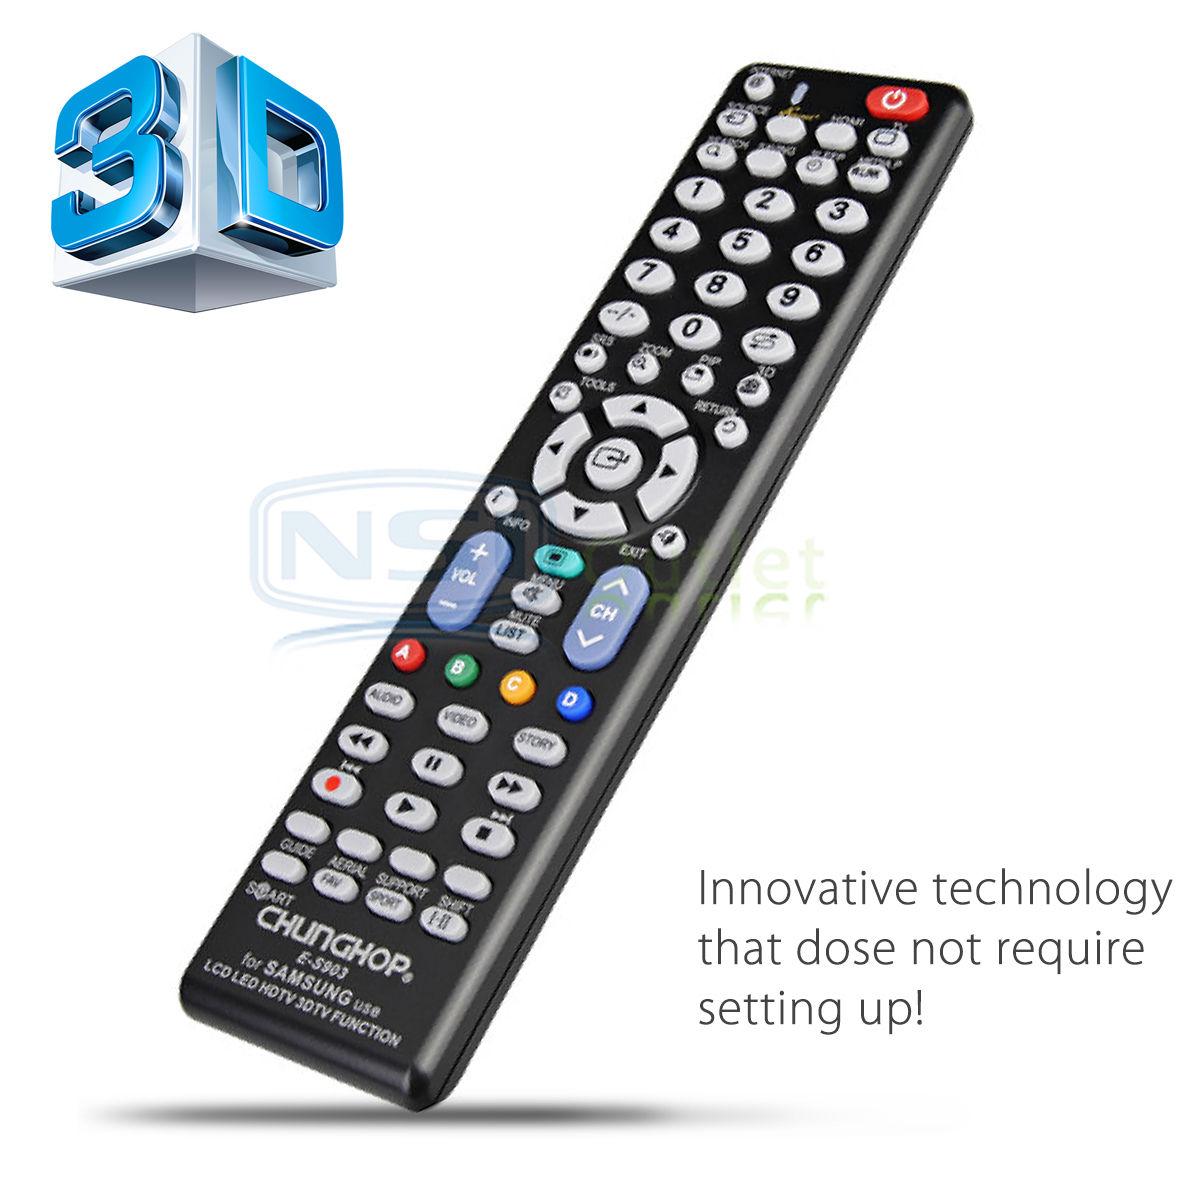 samsung lcd tv remote control manual